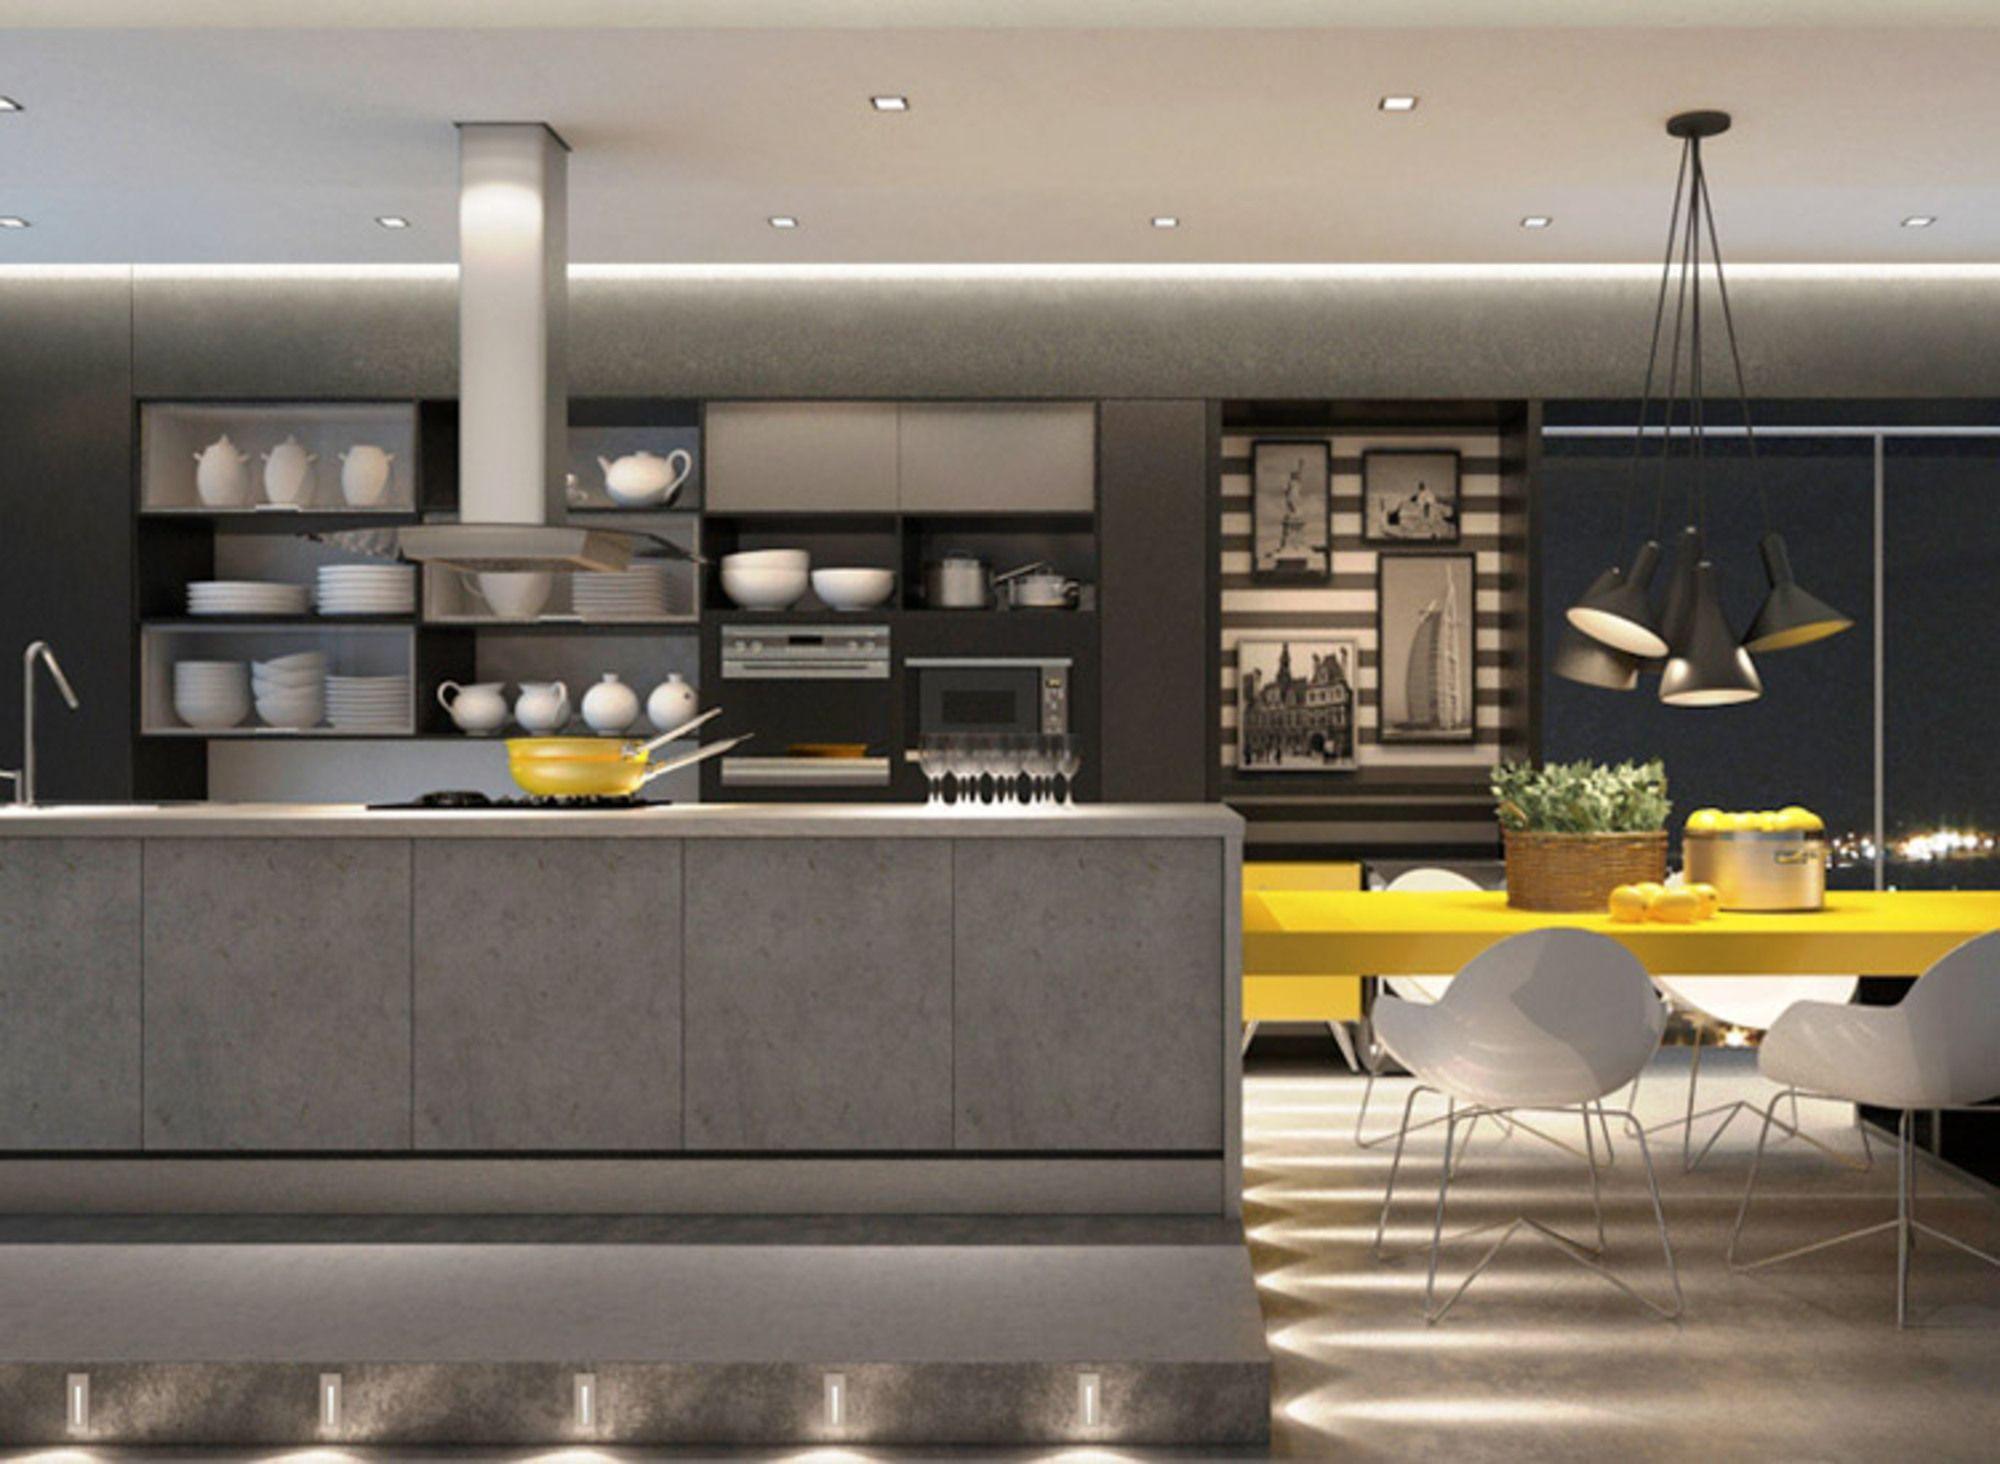 Cozinha De Concreto Na Decoração. Kitchen DesignModern KitchensInterior  DesignBlogValentinaGray KitchensConcrete KitchenArquiteturaIdeas